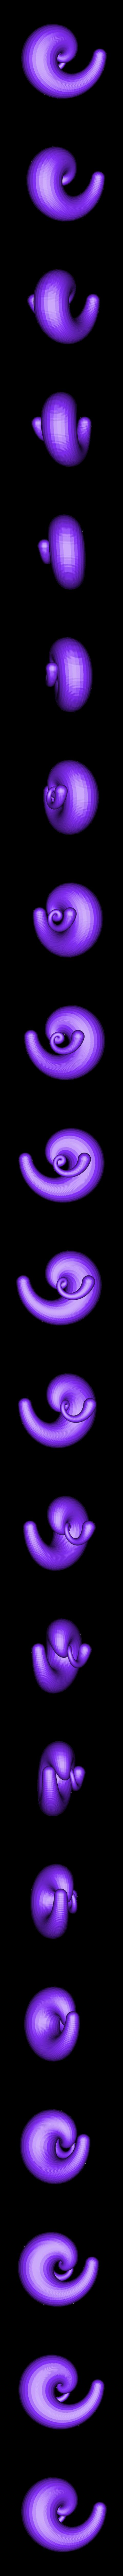 spirale0103.stl Download STL file Spiral 03 • 3D print template, 3dup_bzh